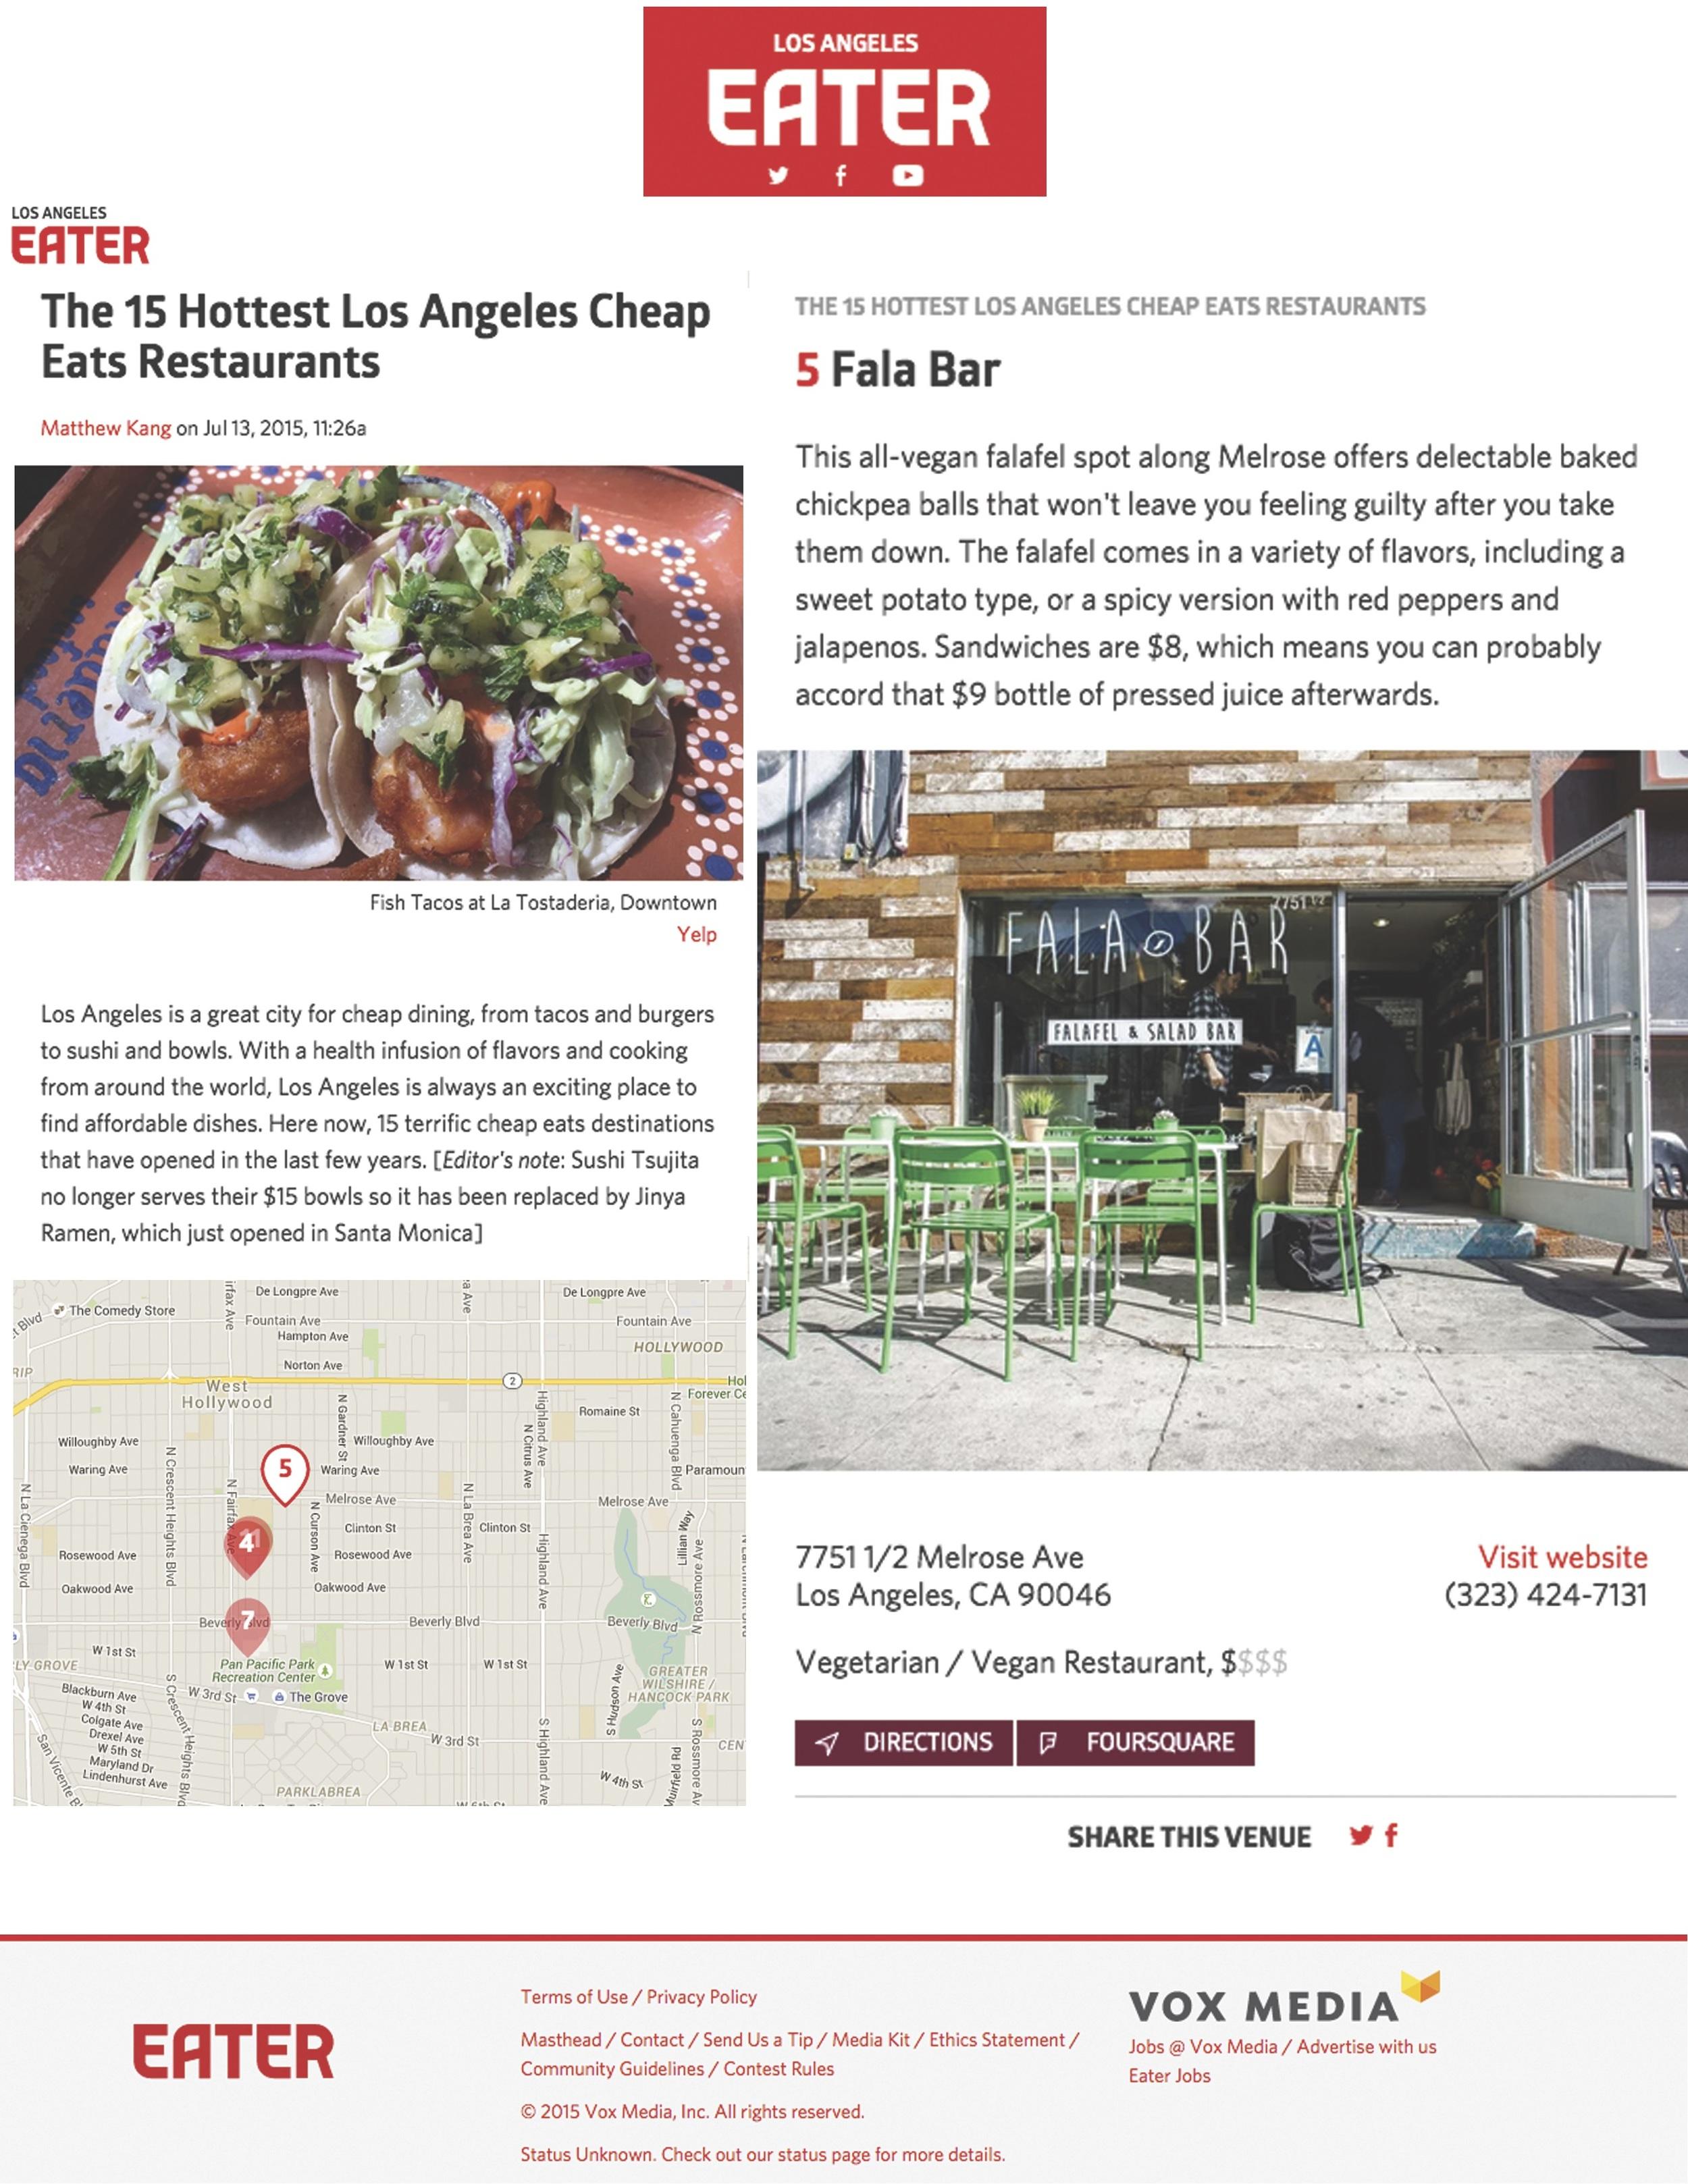 Report about Fala Bar / Loa Angeles Eater